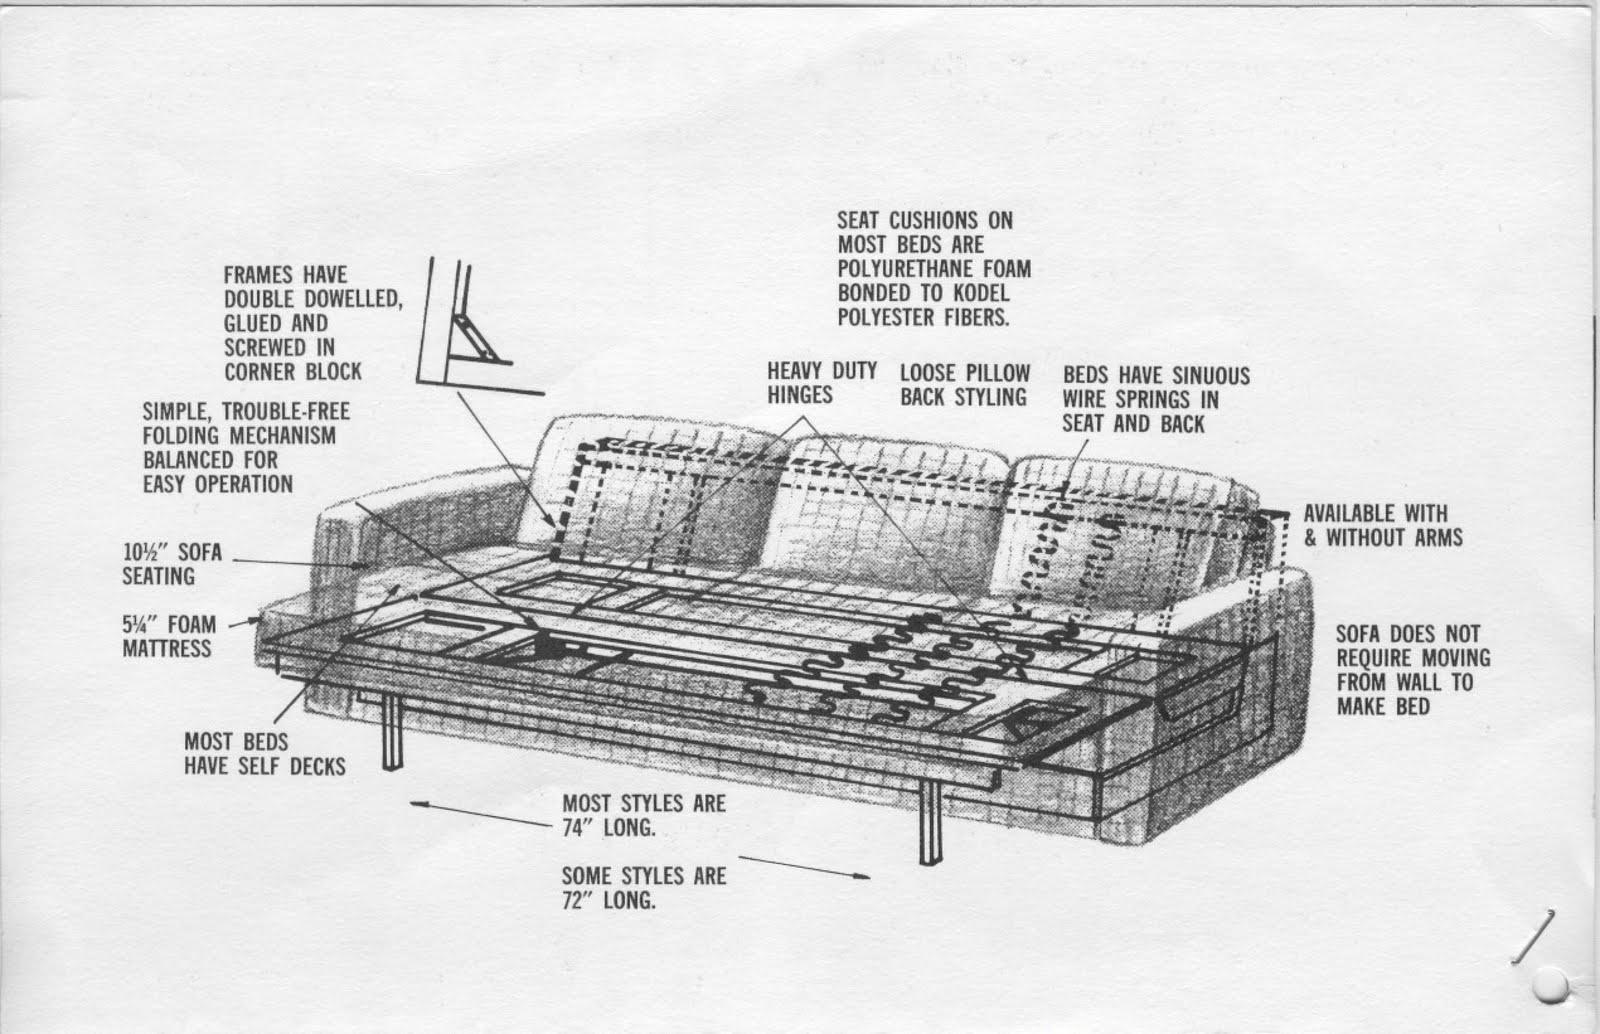 1983 Fleetwood Pace Arrow Owners Manuals Flex Steel Sofa Bed